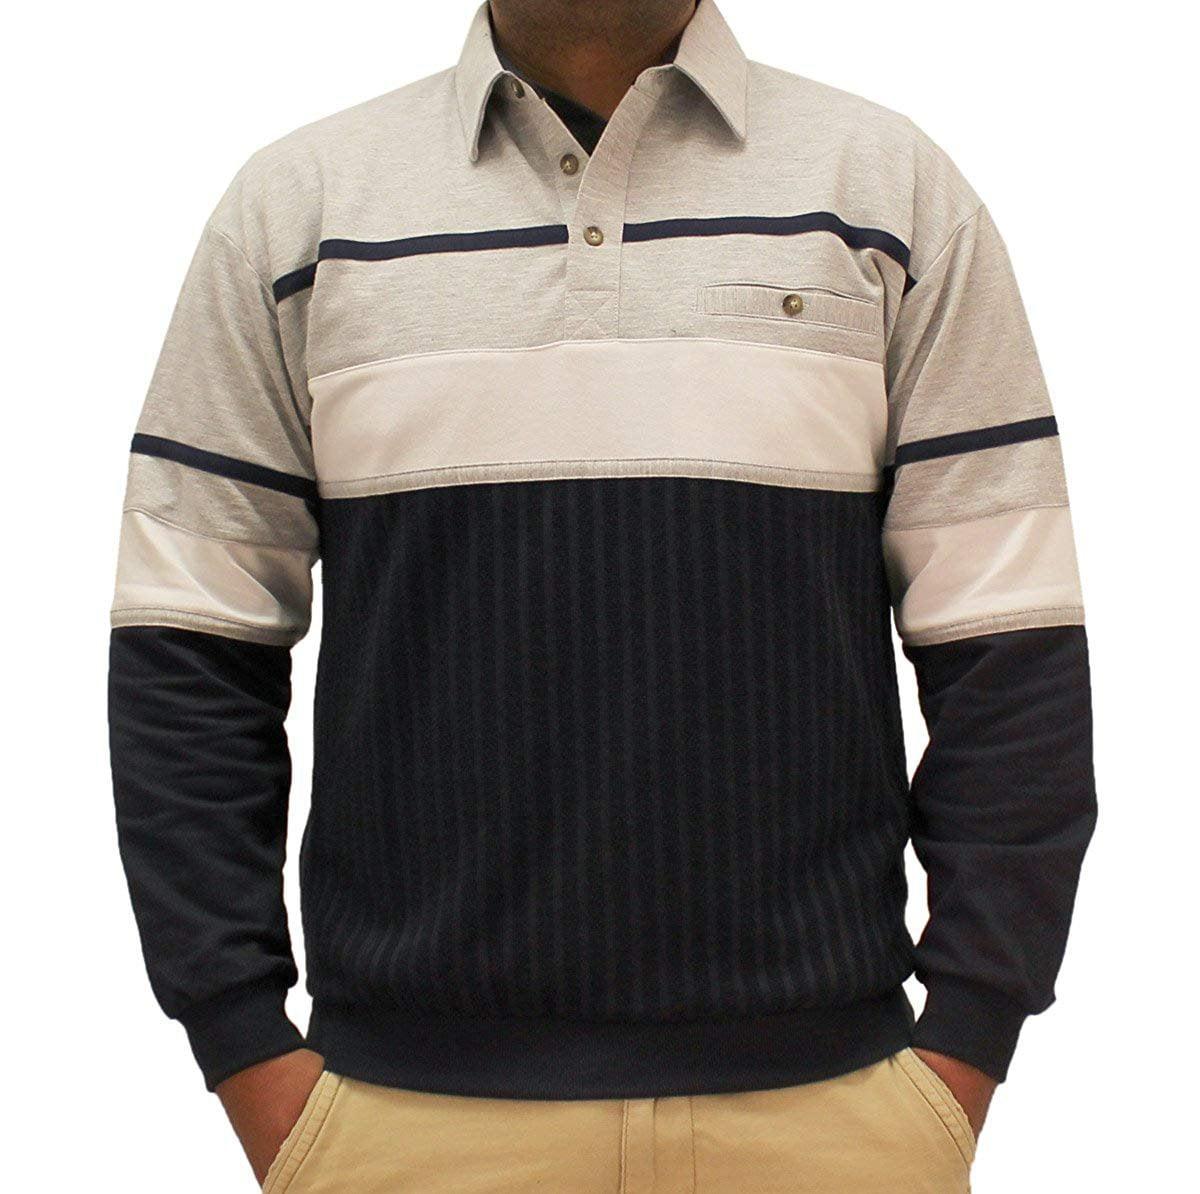 Classics by Palmland Horizontal Stripes Long Sleeve Banded Bottom Shirt